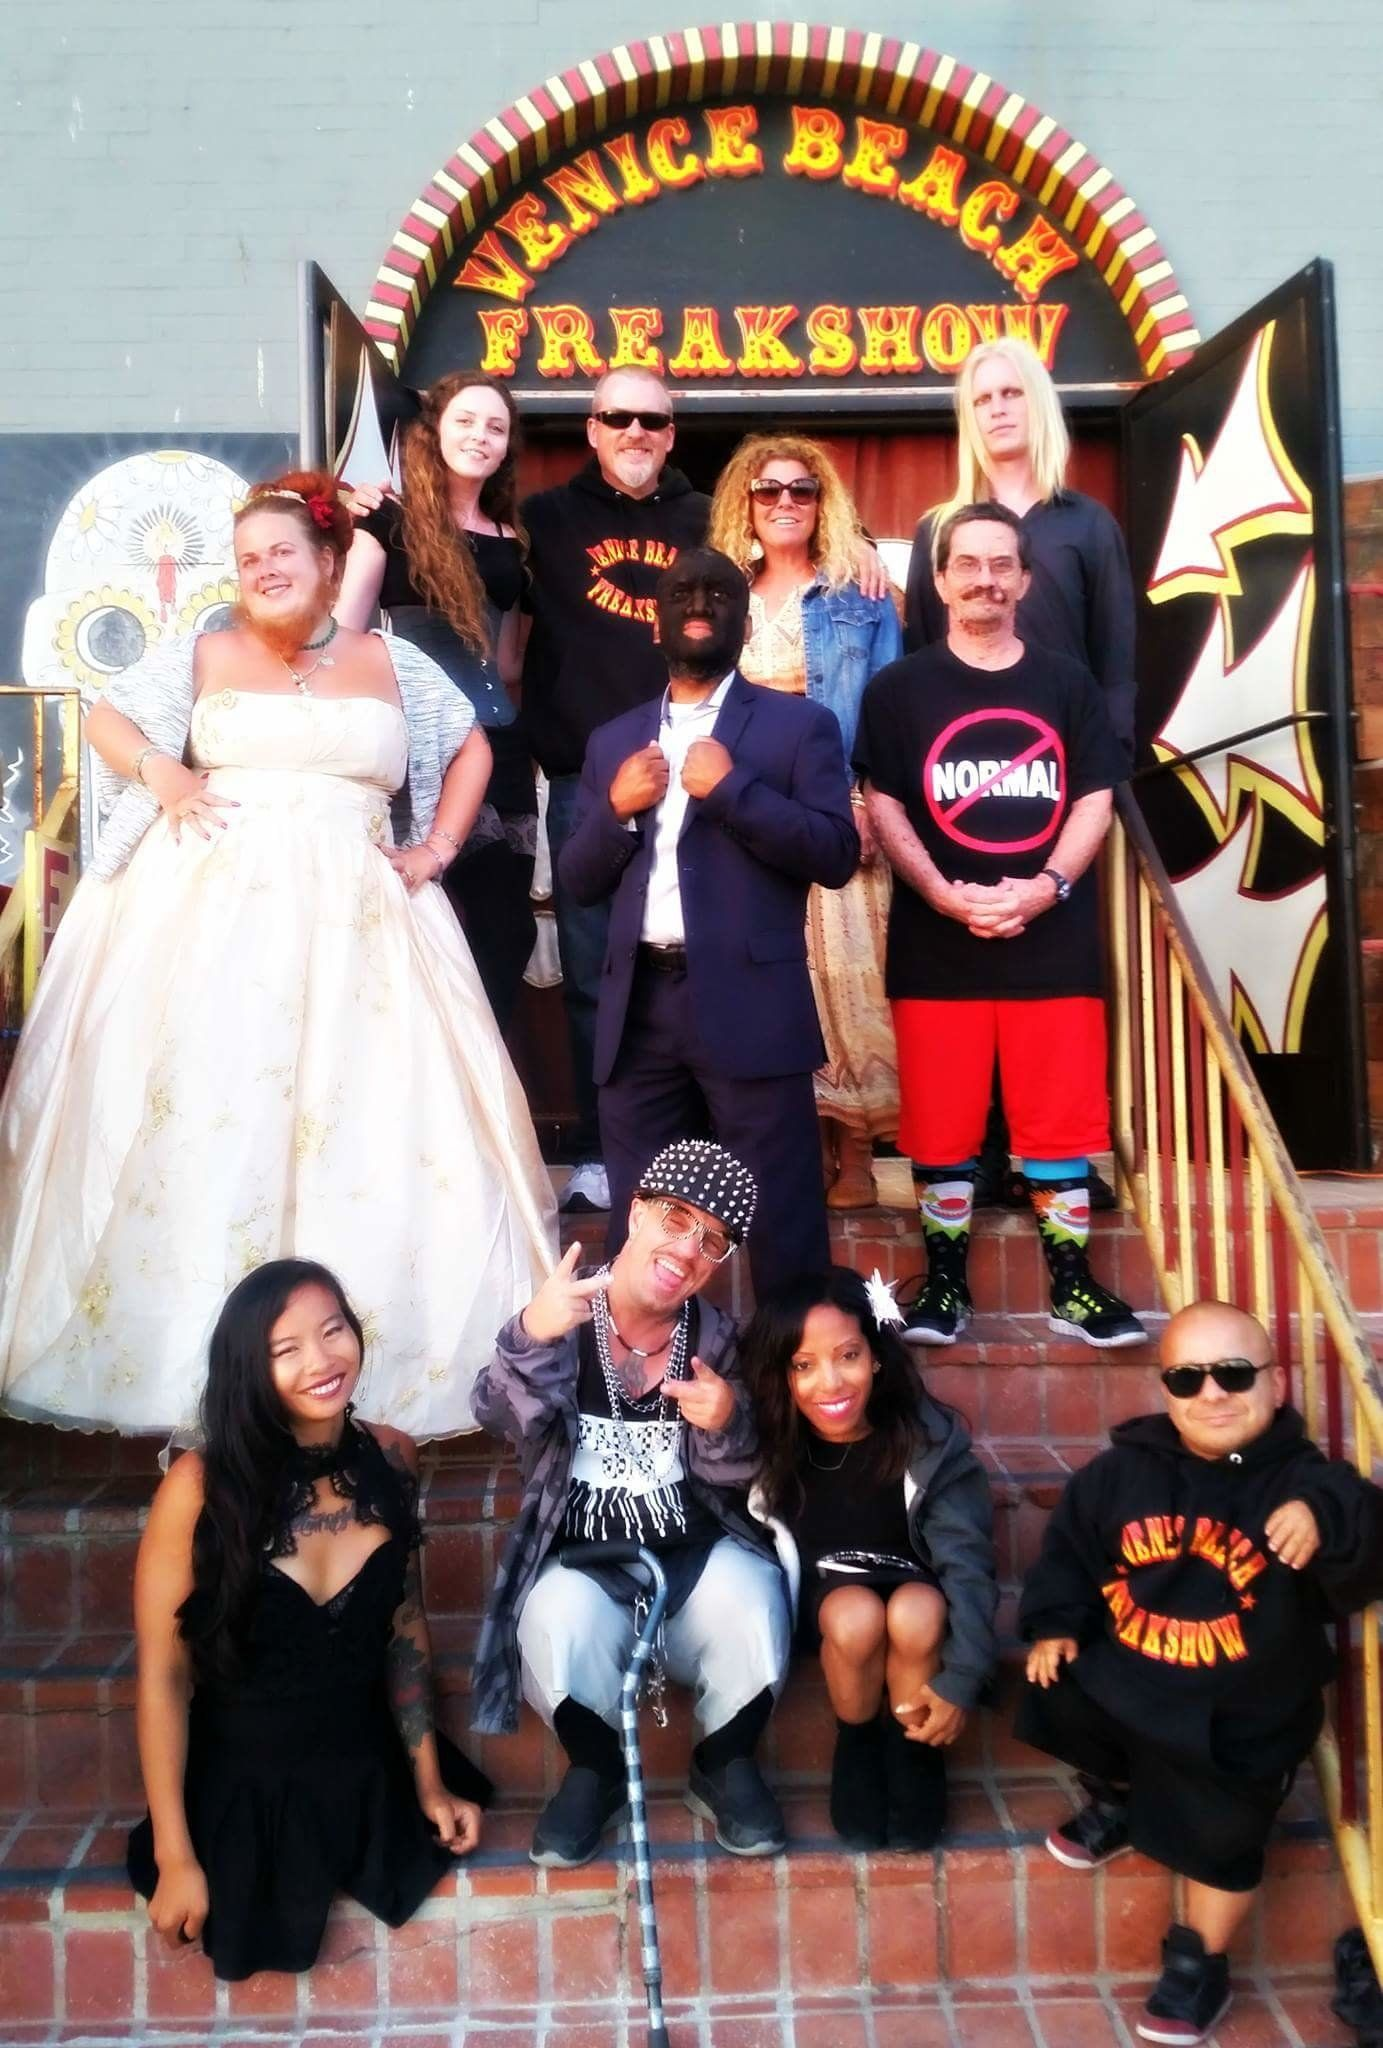 The Venice Beach Freakshow is closing its doors on Sunday